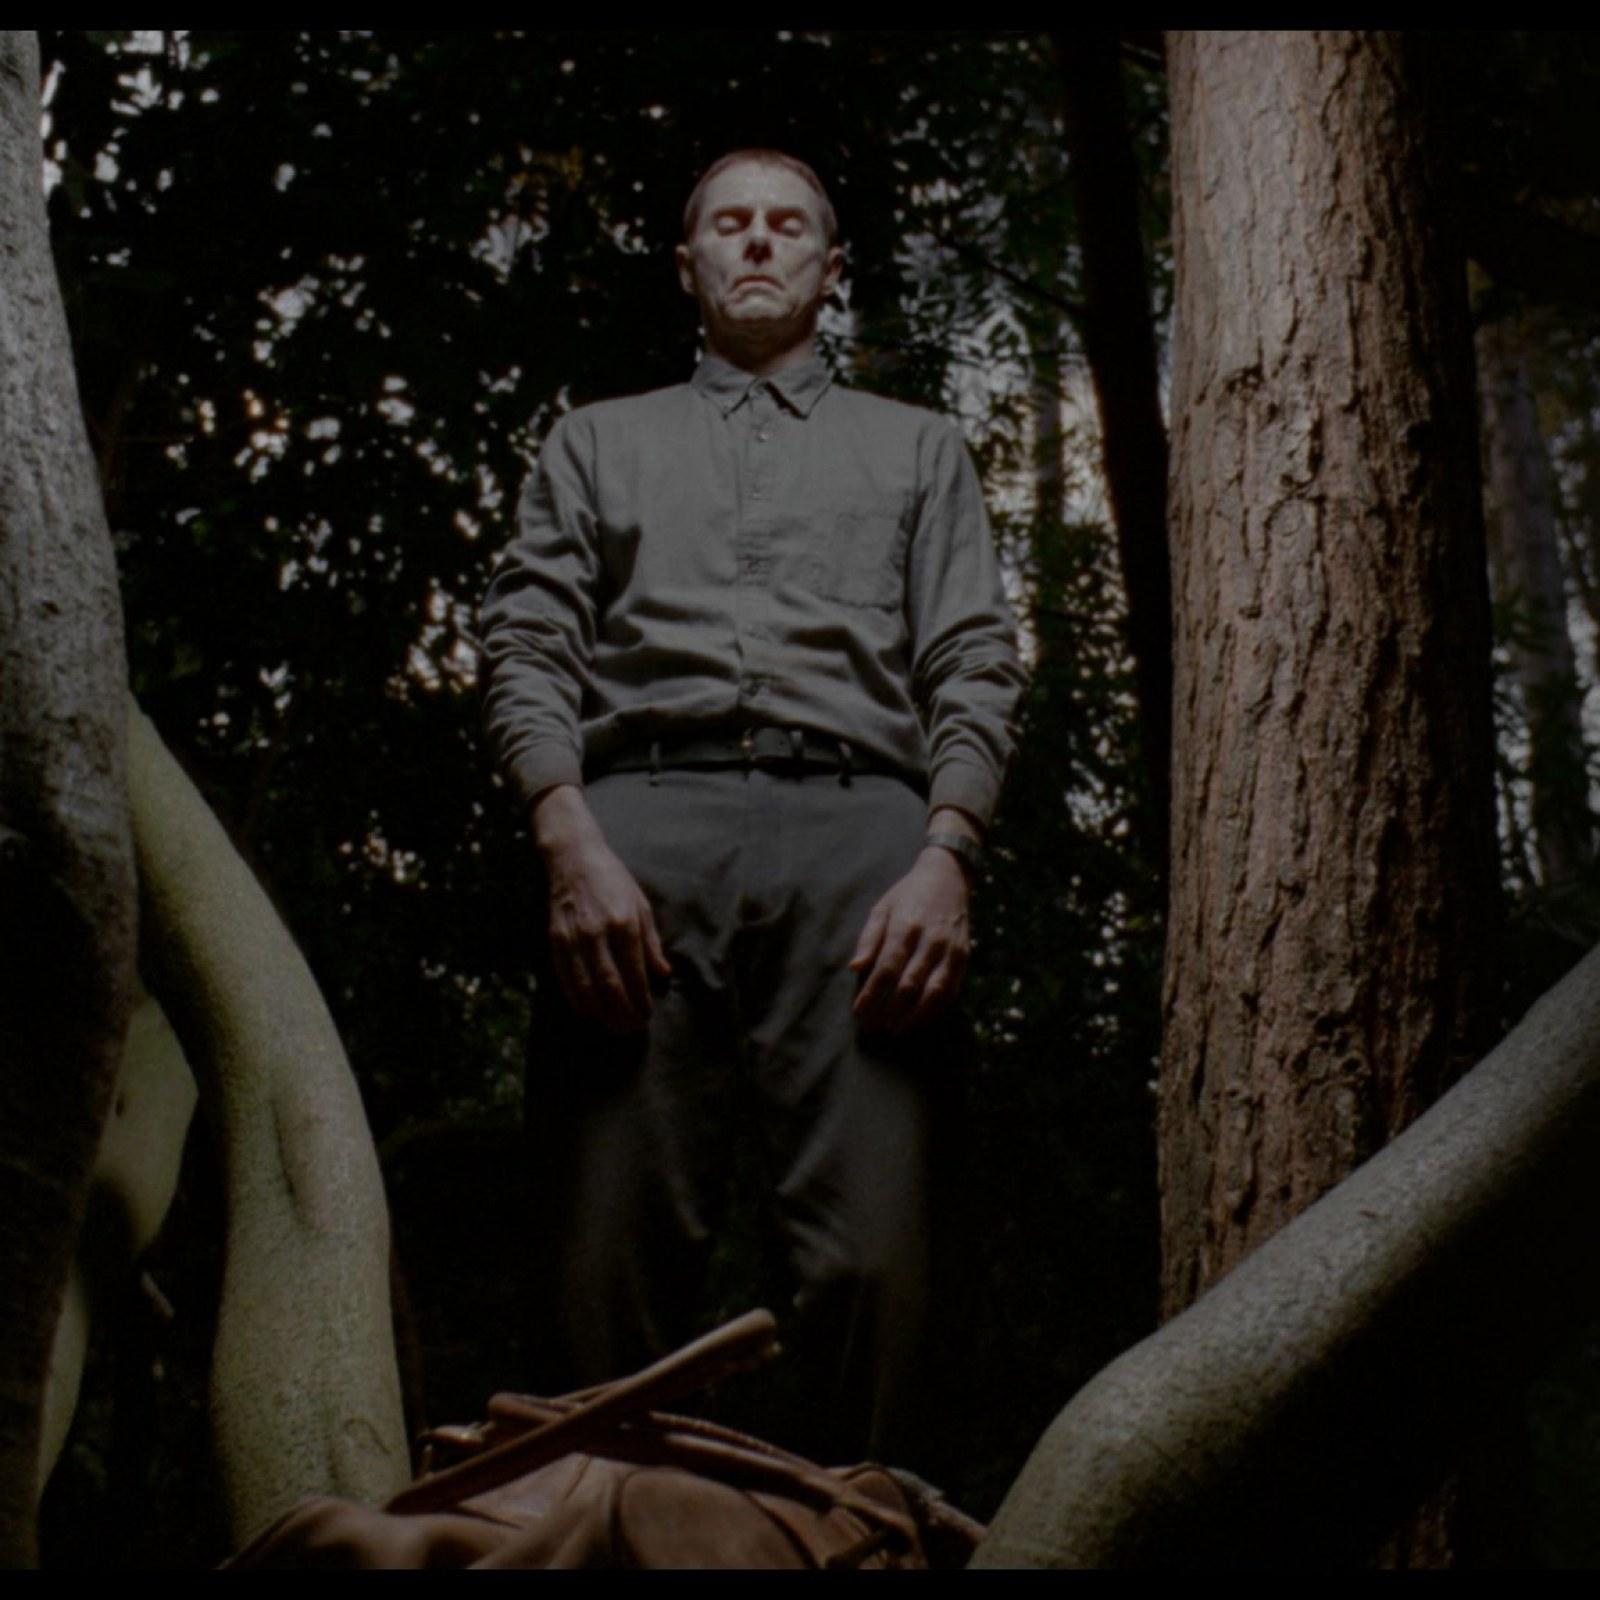 Possum' Director Matthew Holness Believes Horror Can